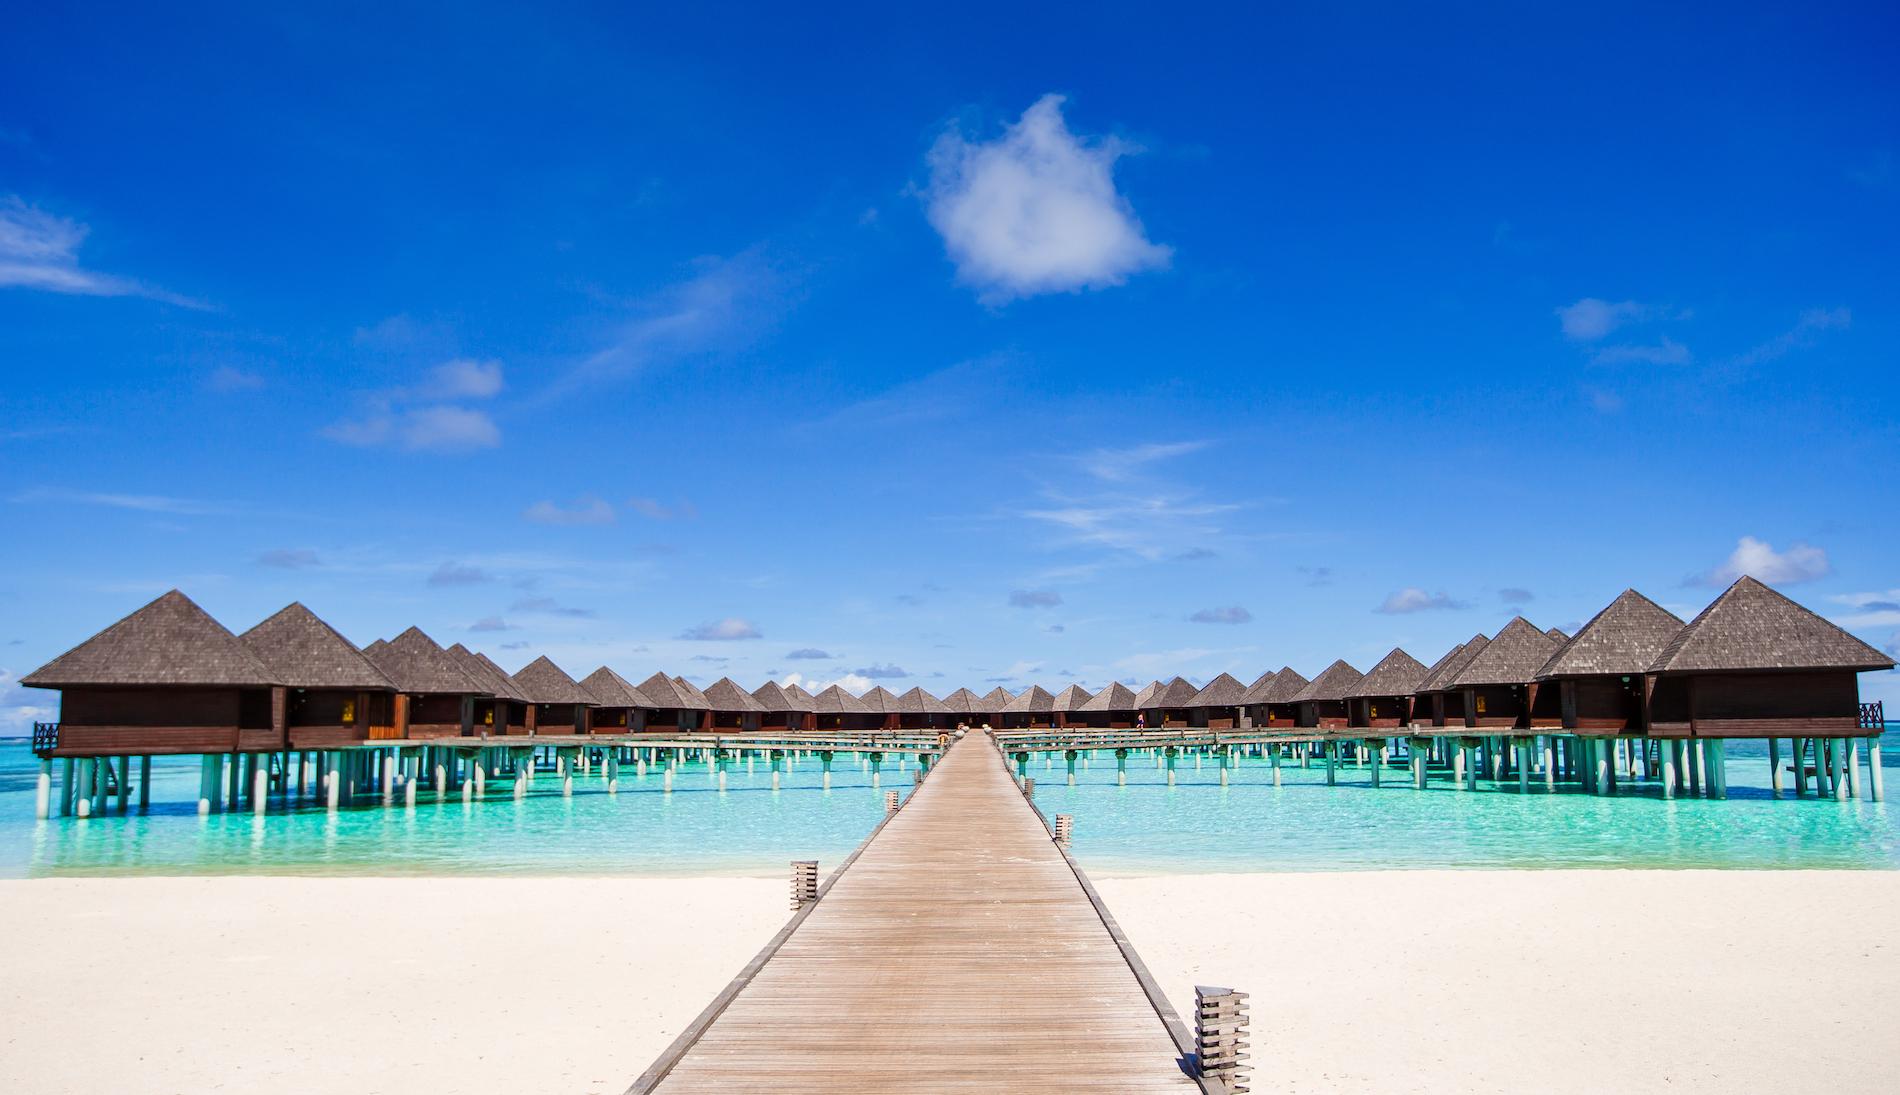 OFID announces $10 million loan for Bank of Maldives to revive tourism